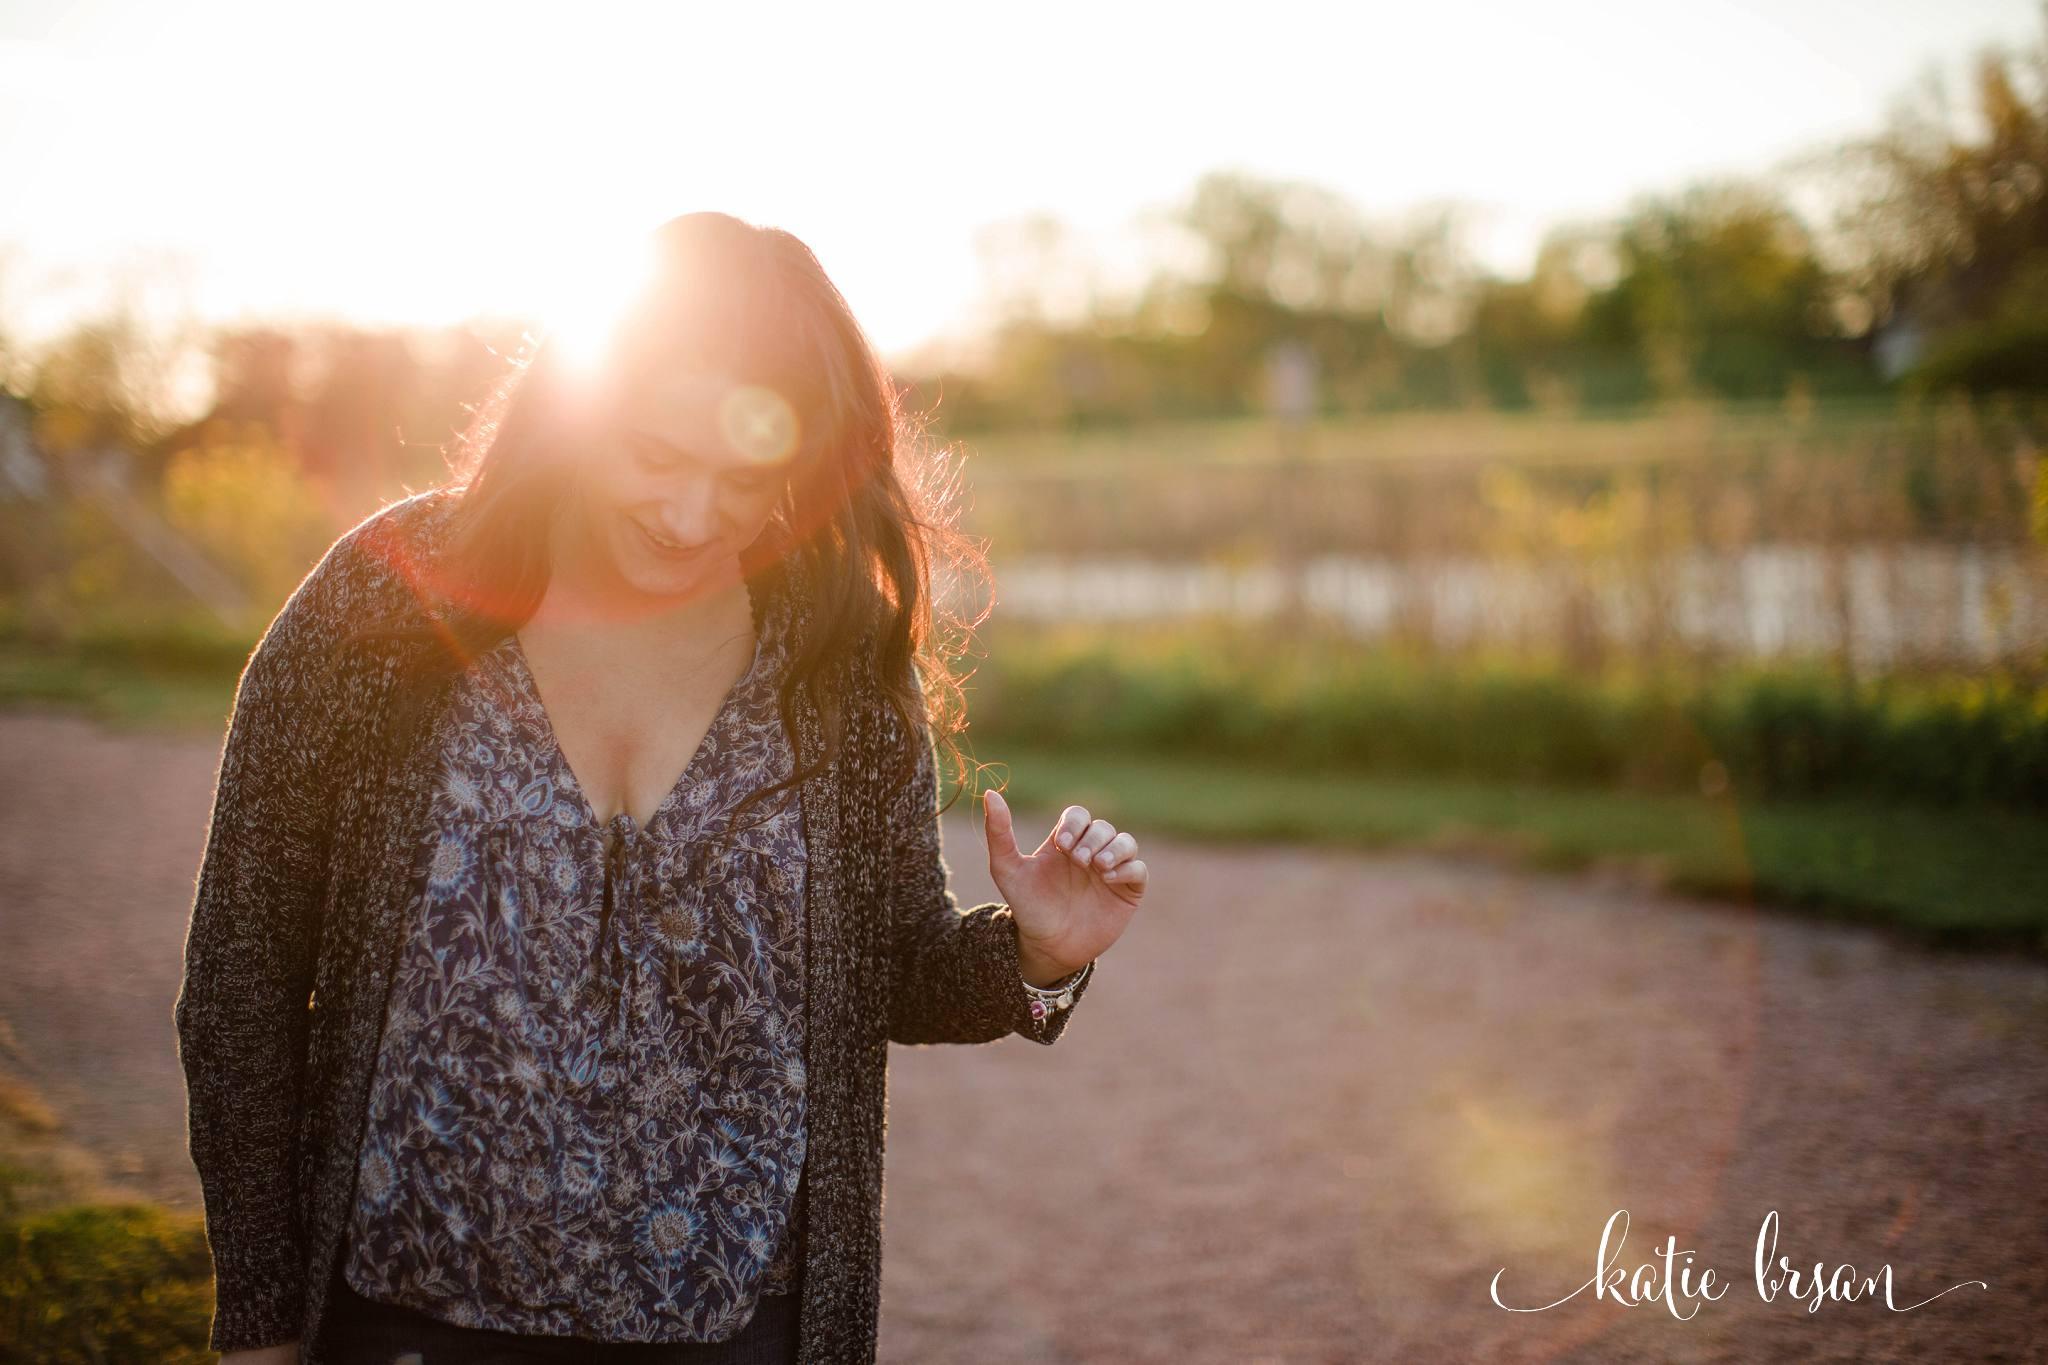 KatieBrsan-Frantfort-seniorphotographer_0547.jpg